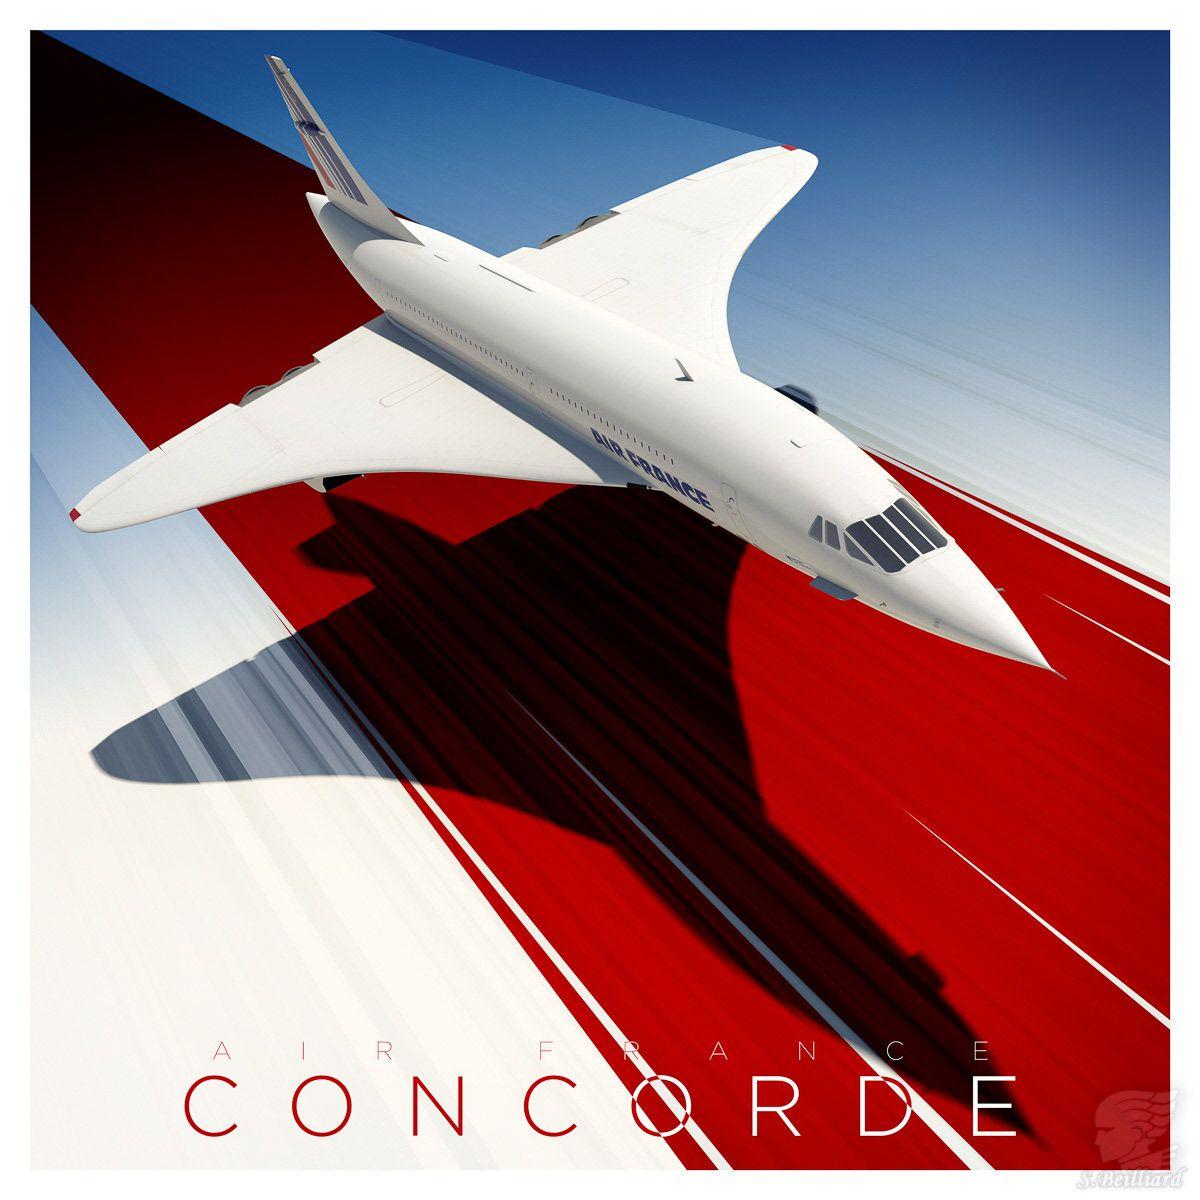 Concorde People Pop Art Limited Edition Signed Art Print Luxury Travel Aeroplane